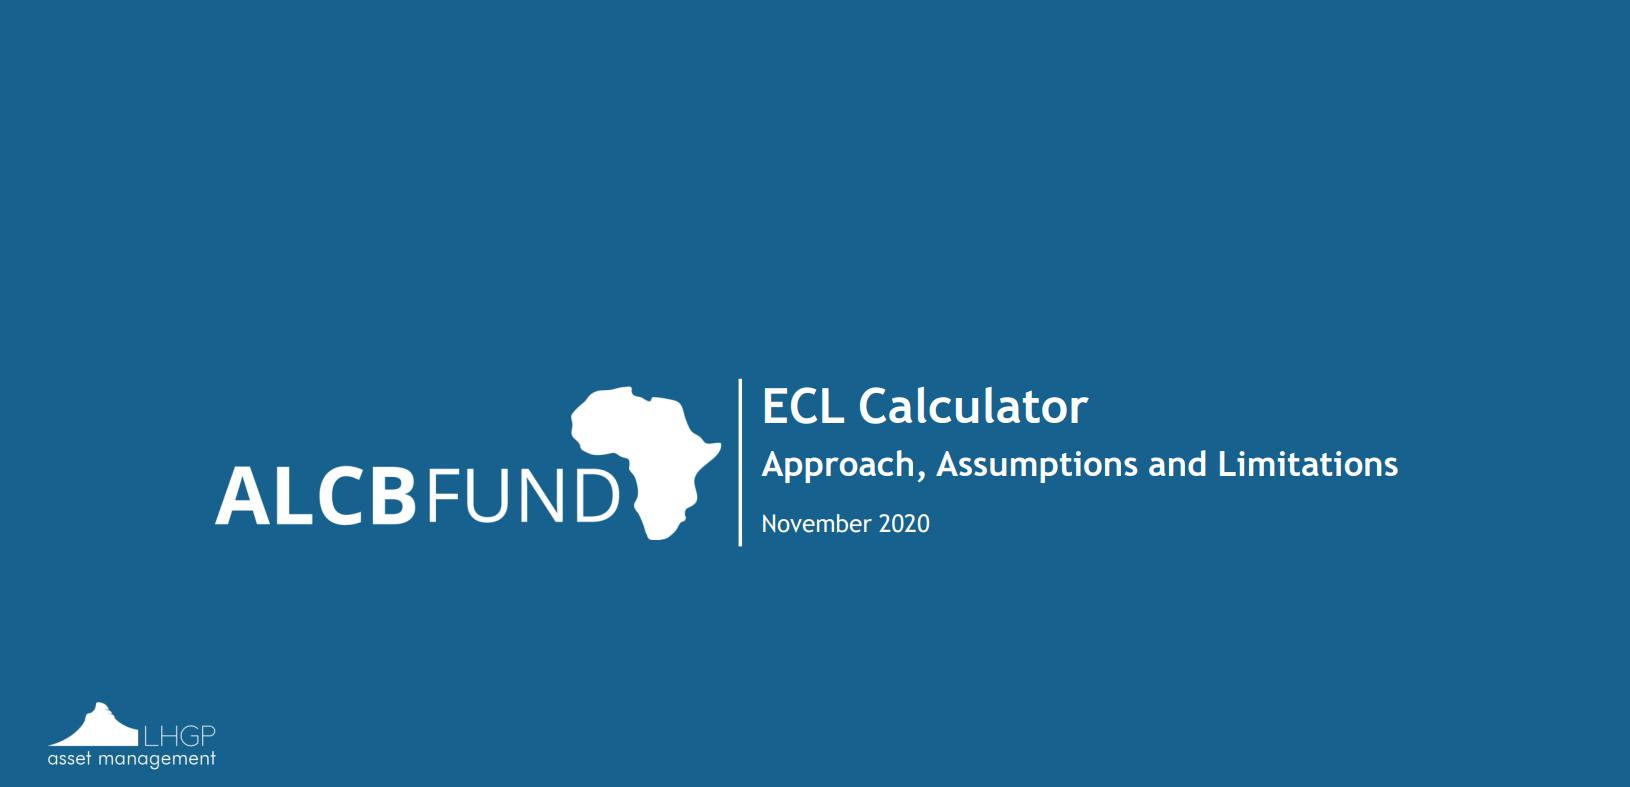 ECL Calculator - Approach Paper